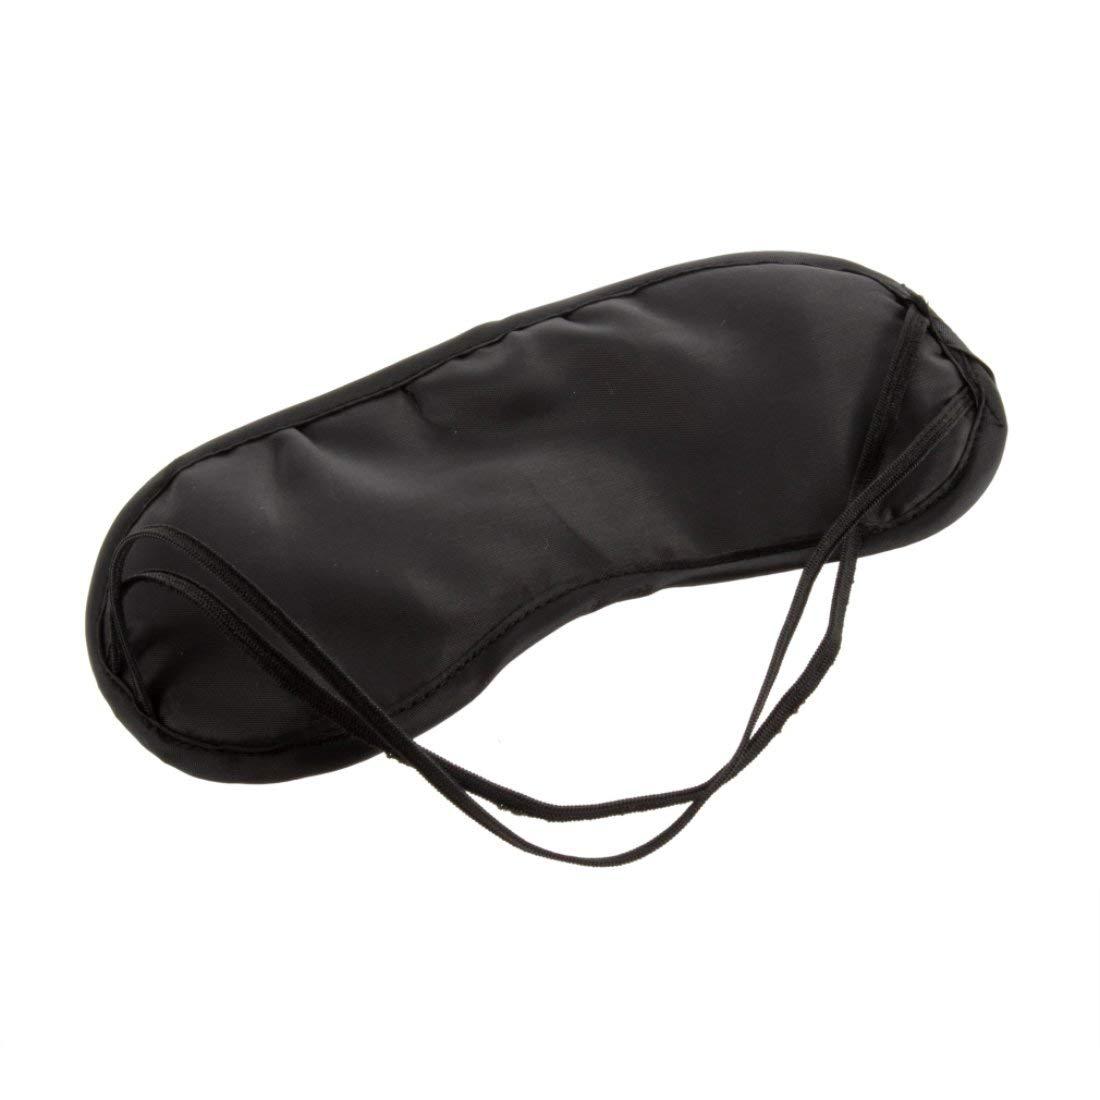 Eye Mask Comfortable Sleeping Mask for Rest Relax Travelling Fashionable Men Women Travel Sleep Aid Eye Mask Eye Patch - Black Formulaone